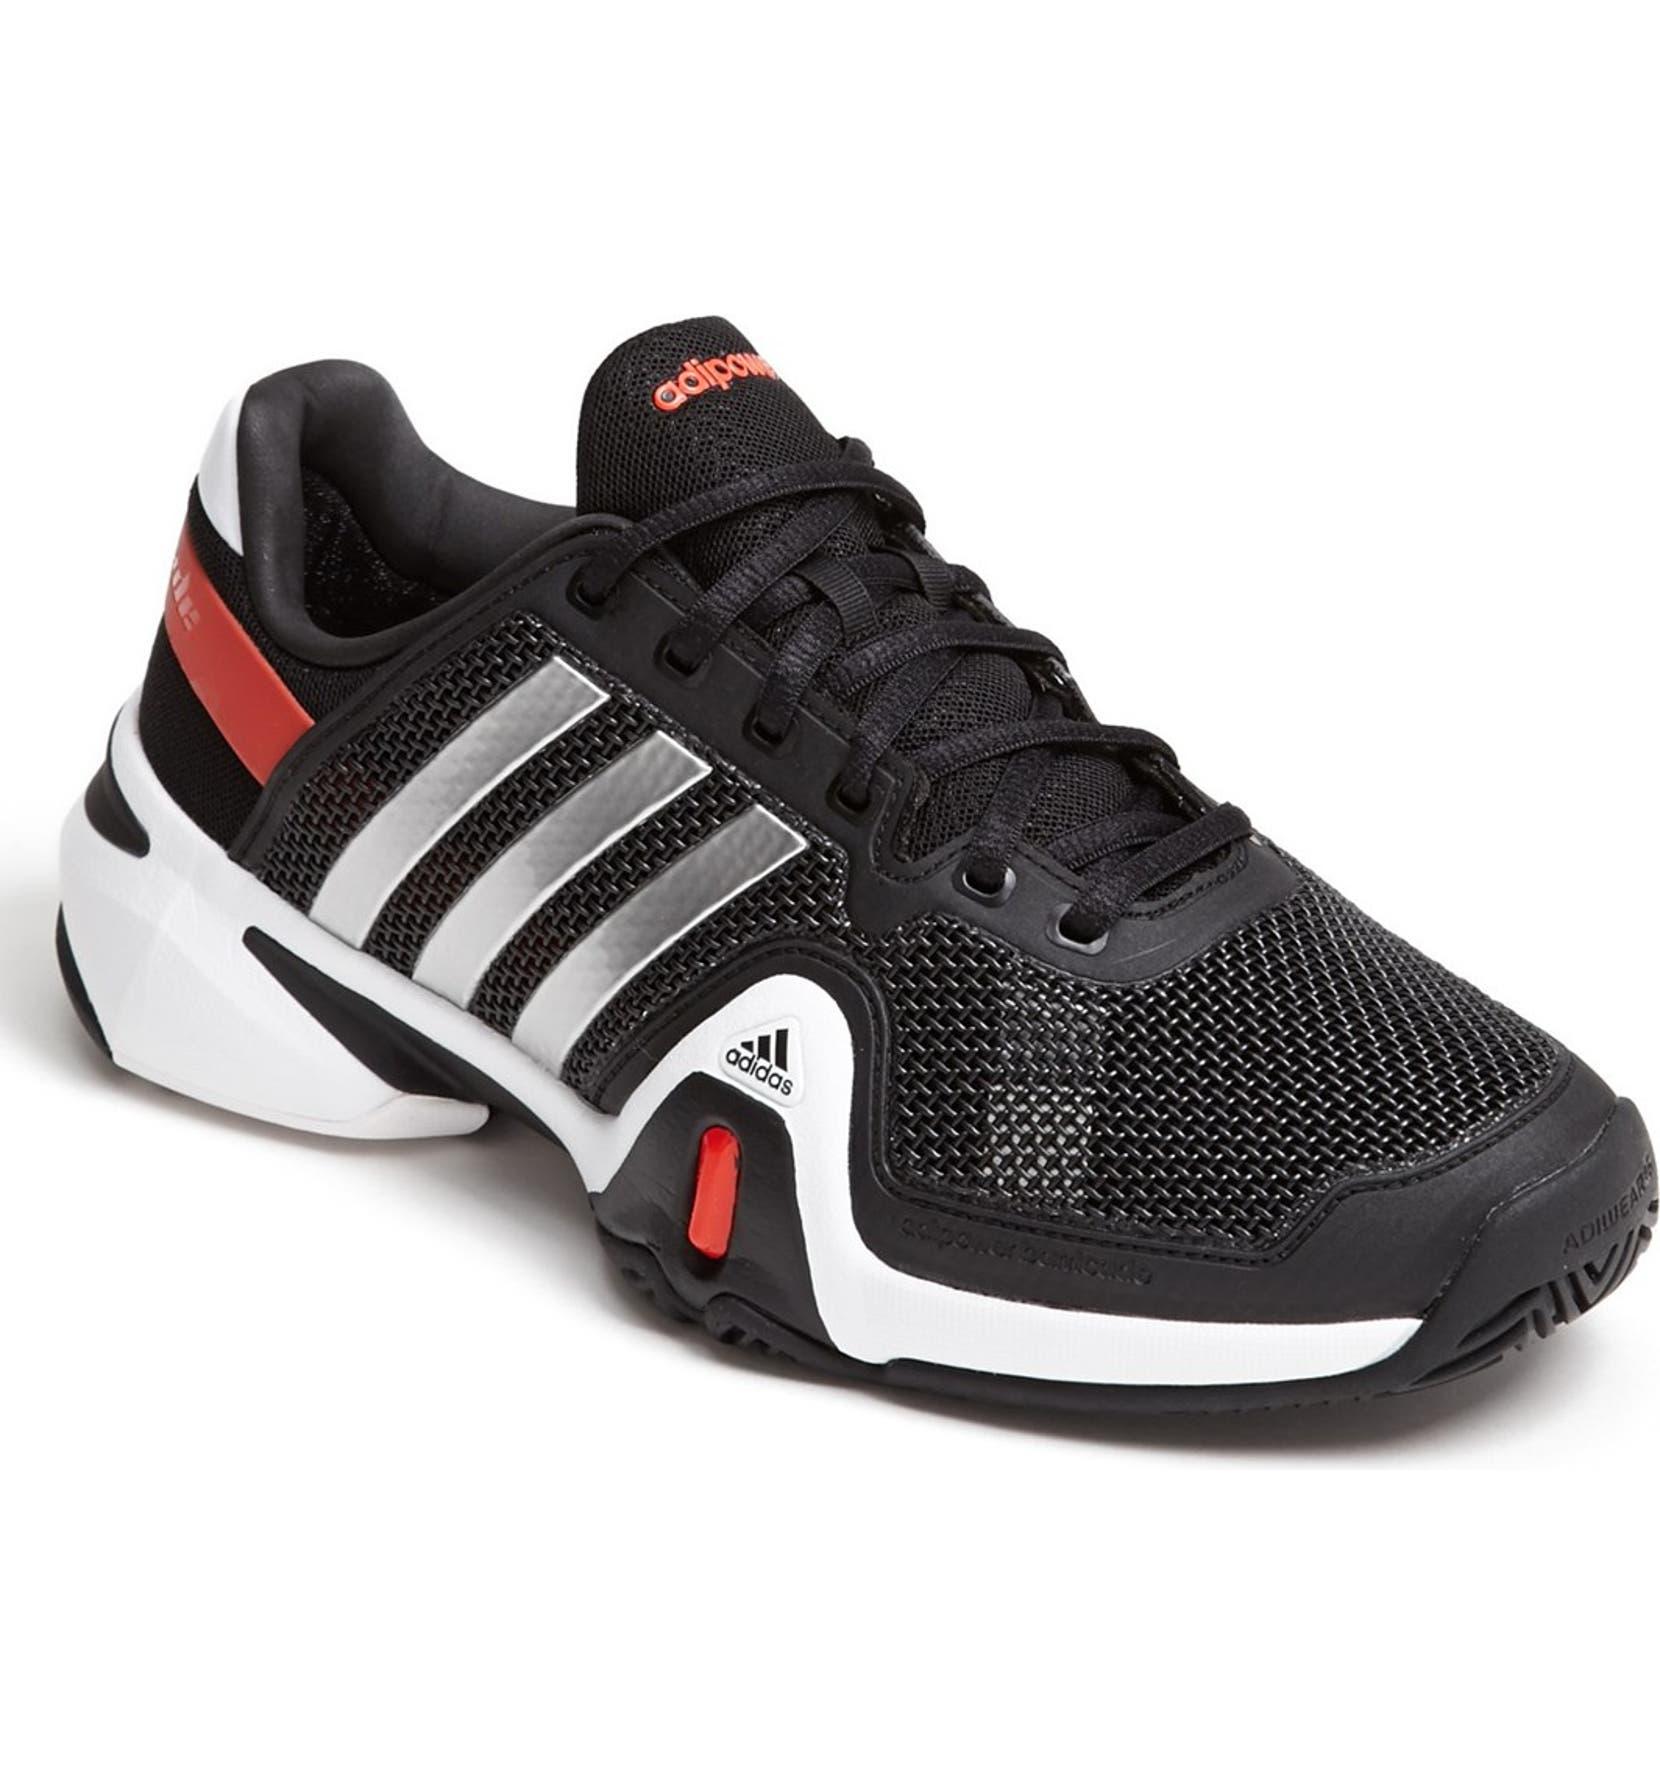 Adidas Tennis 8' Barricade 'adipower ShoemenNordstrom mnwO0yvN8